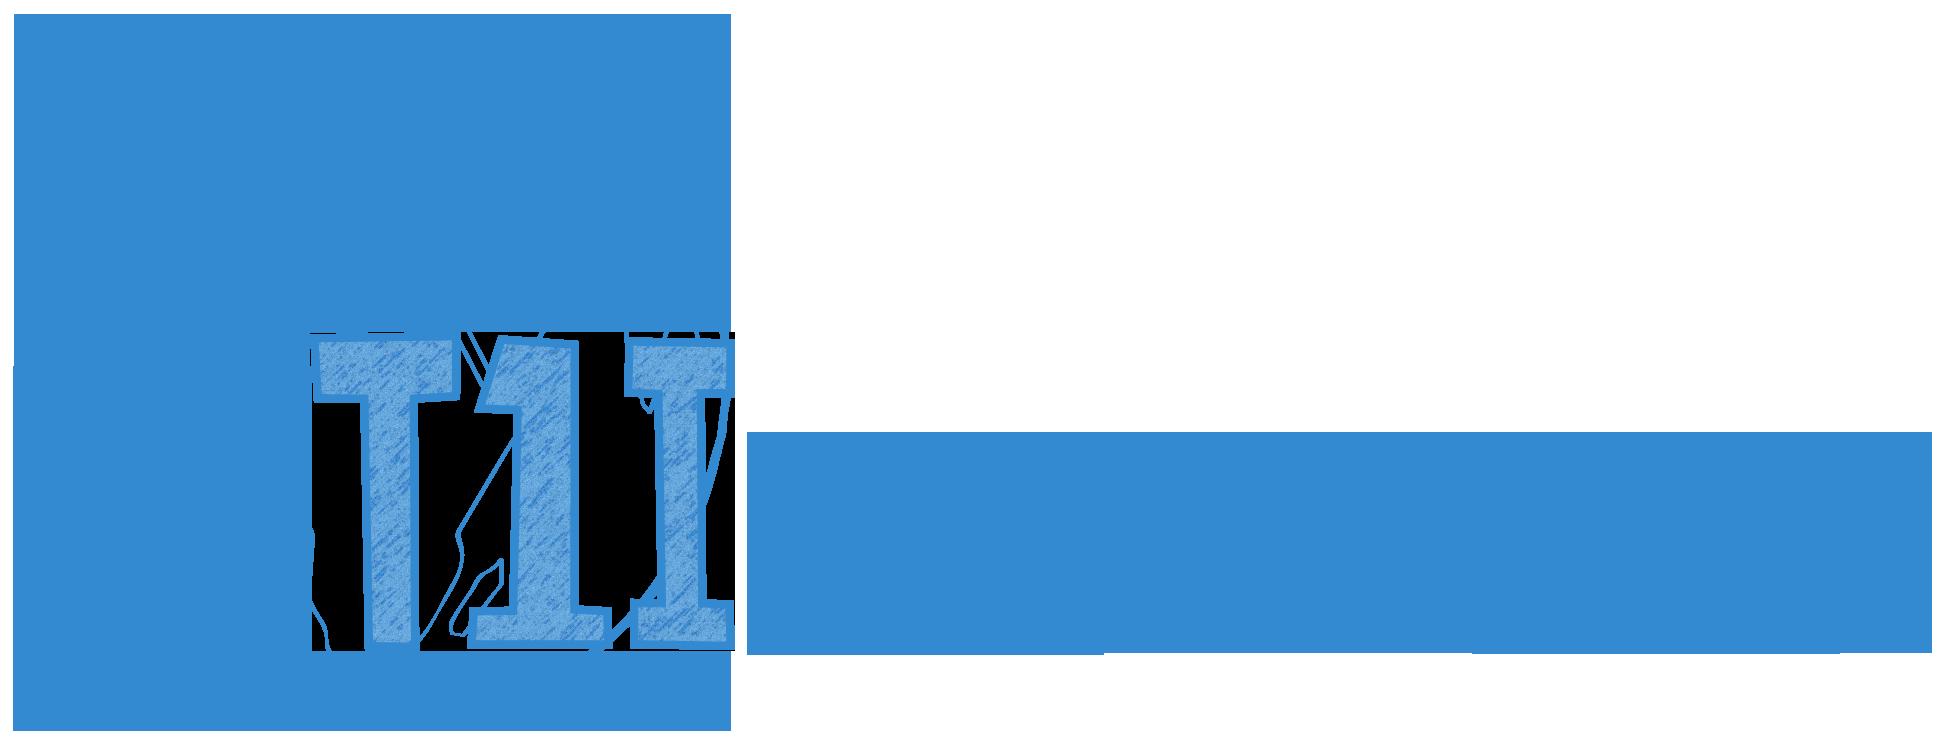 Type 1 International partnership